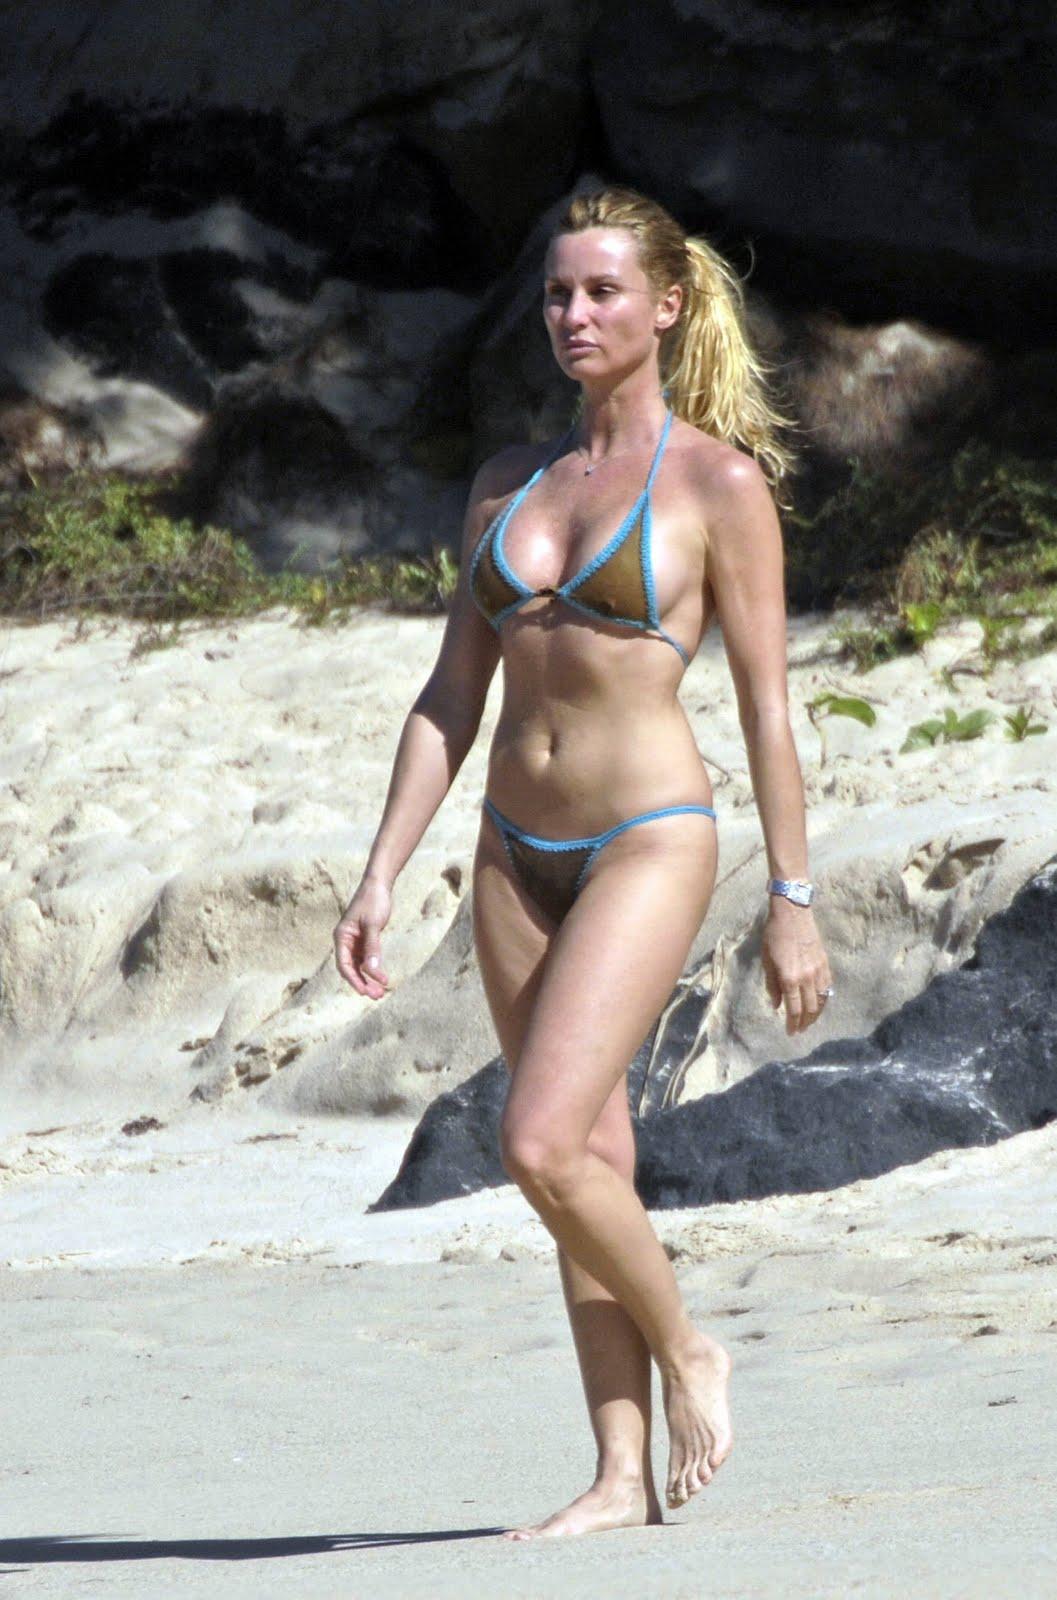 Nicollette Sheridan Feet  Starlight Celebrity-5927